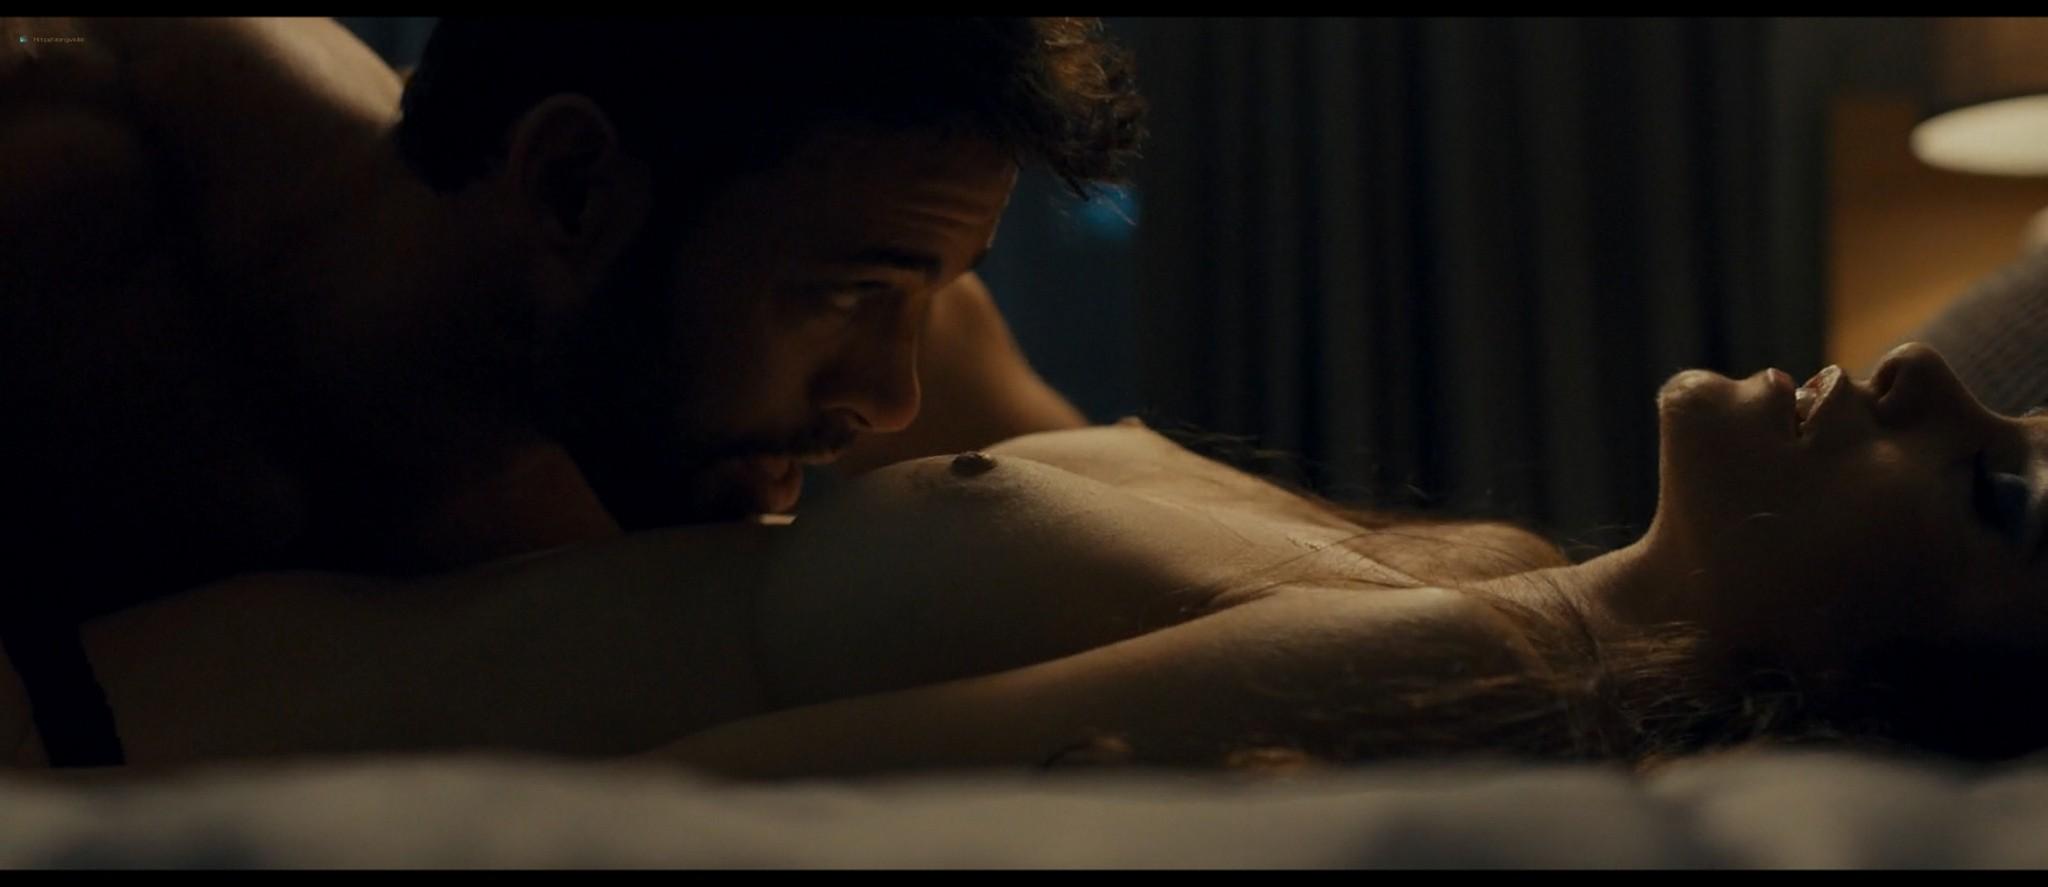 Alicia Sanz nude hot sex - En Brazos de un sesino (2019) HD 1080p Web (6)